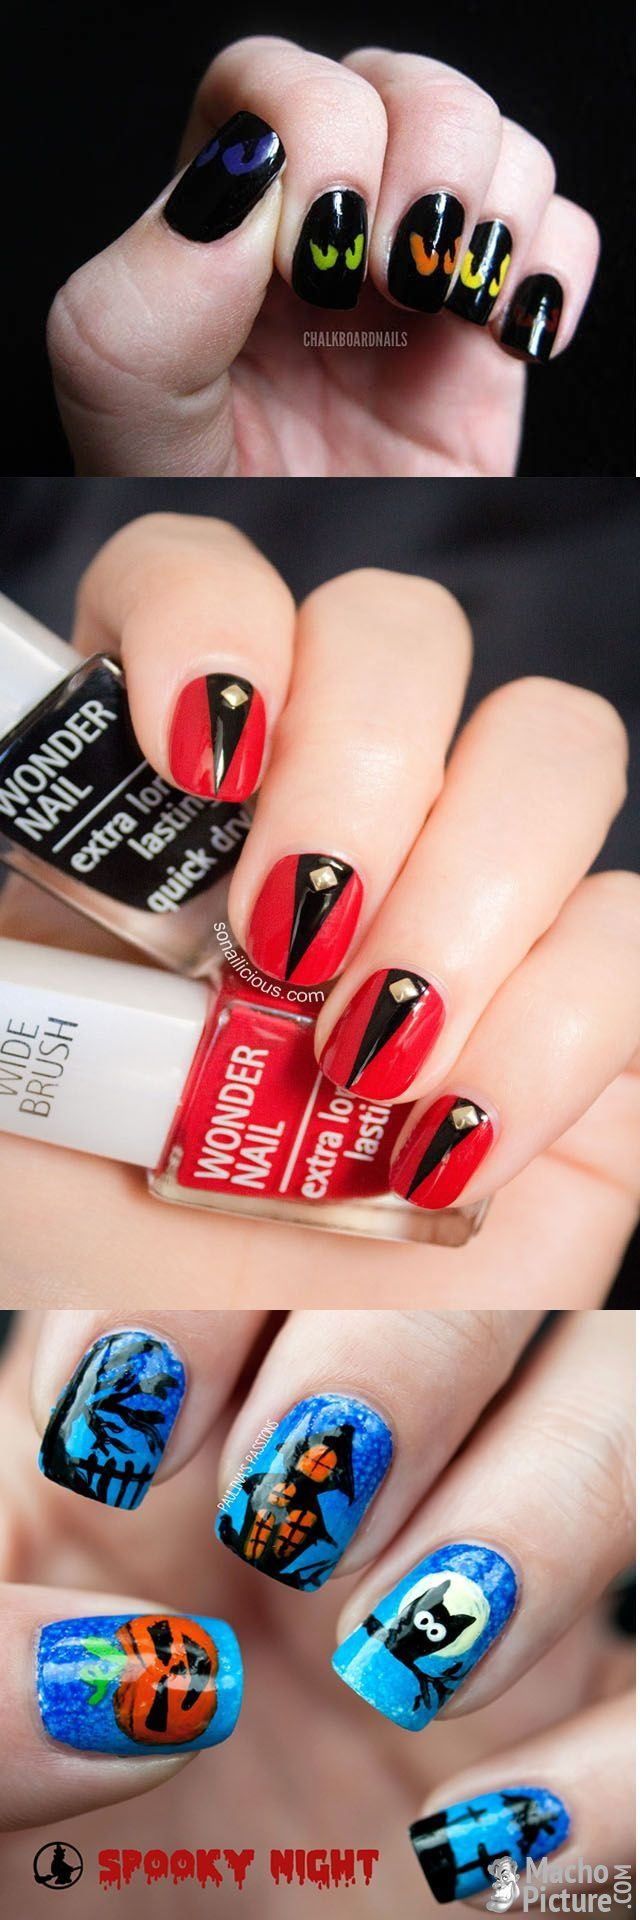 76 best Nägel images on Pinterest   Nail scissors, Halloween nail ...